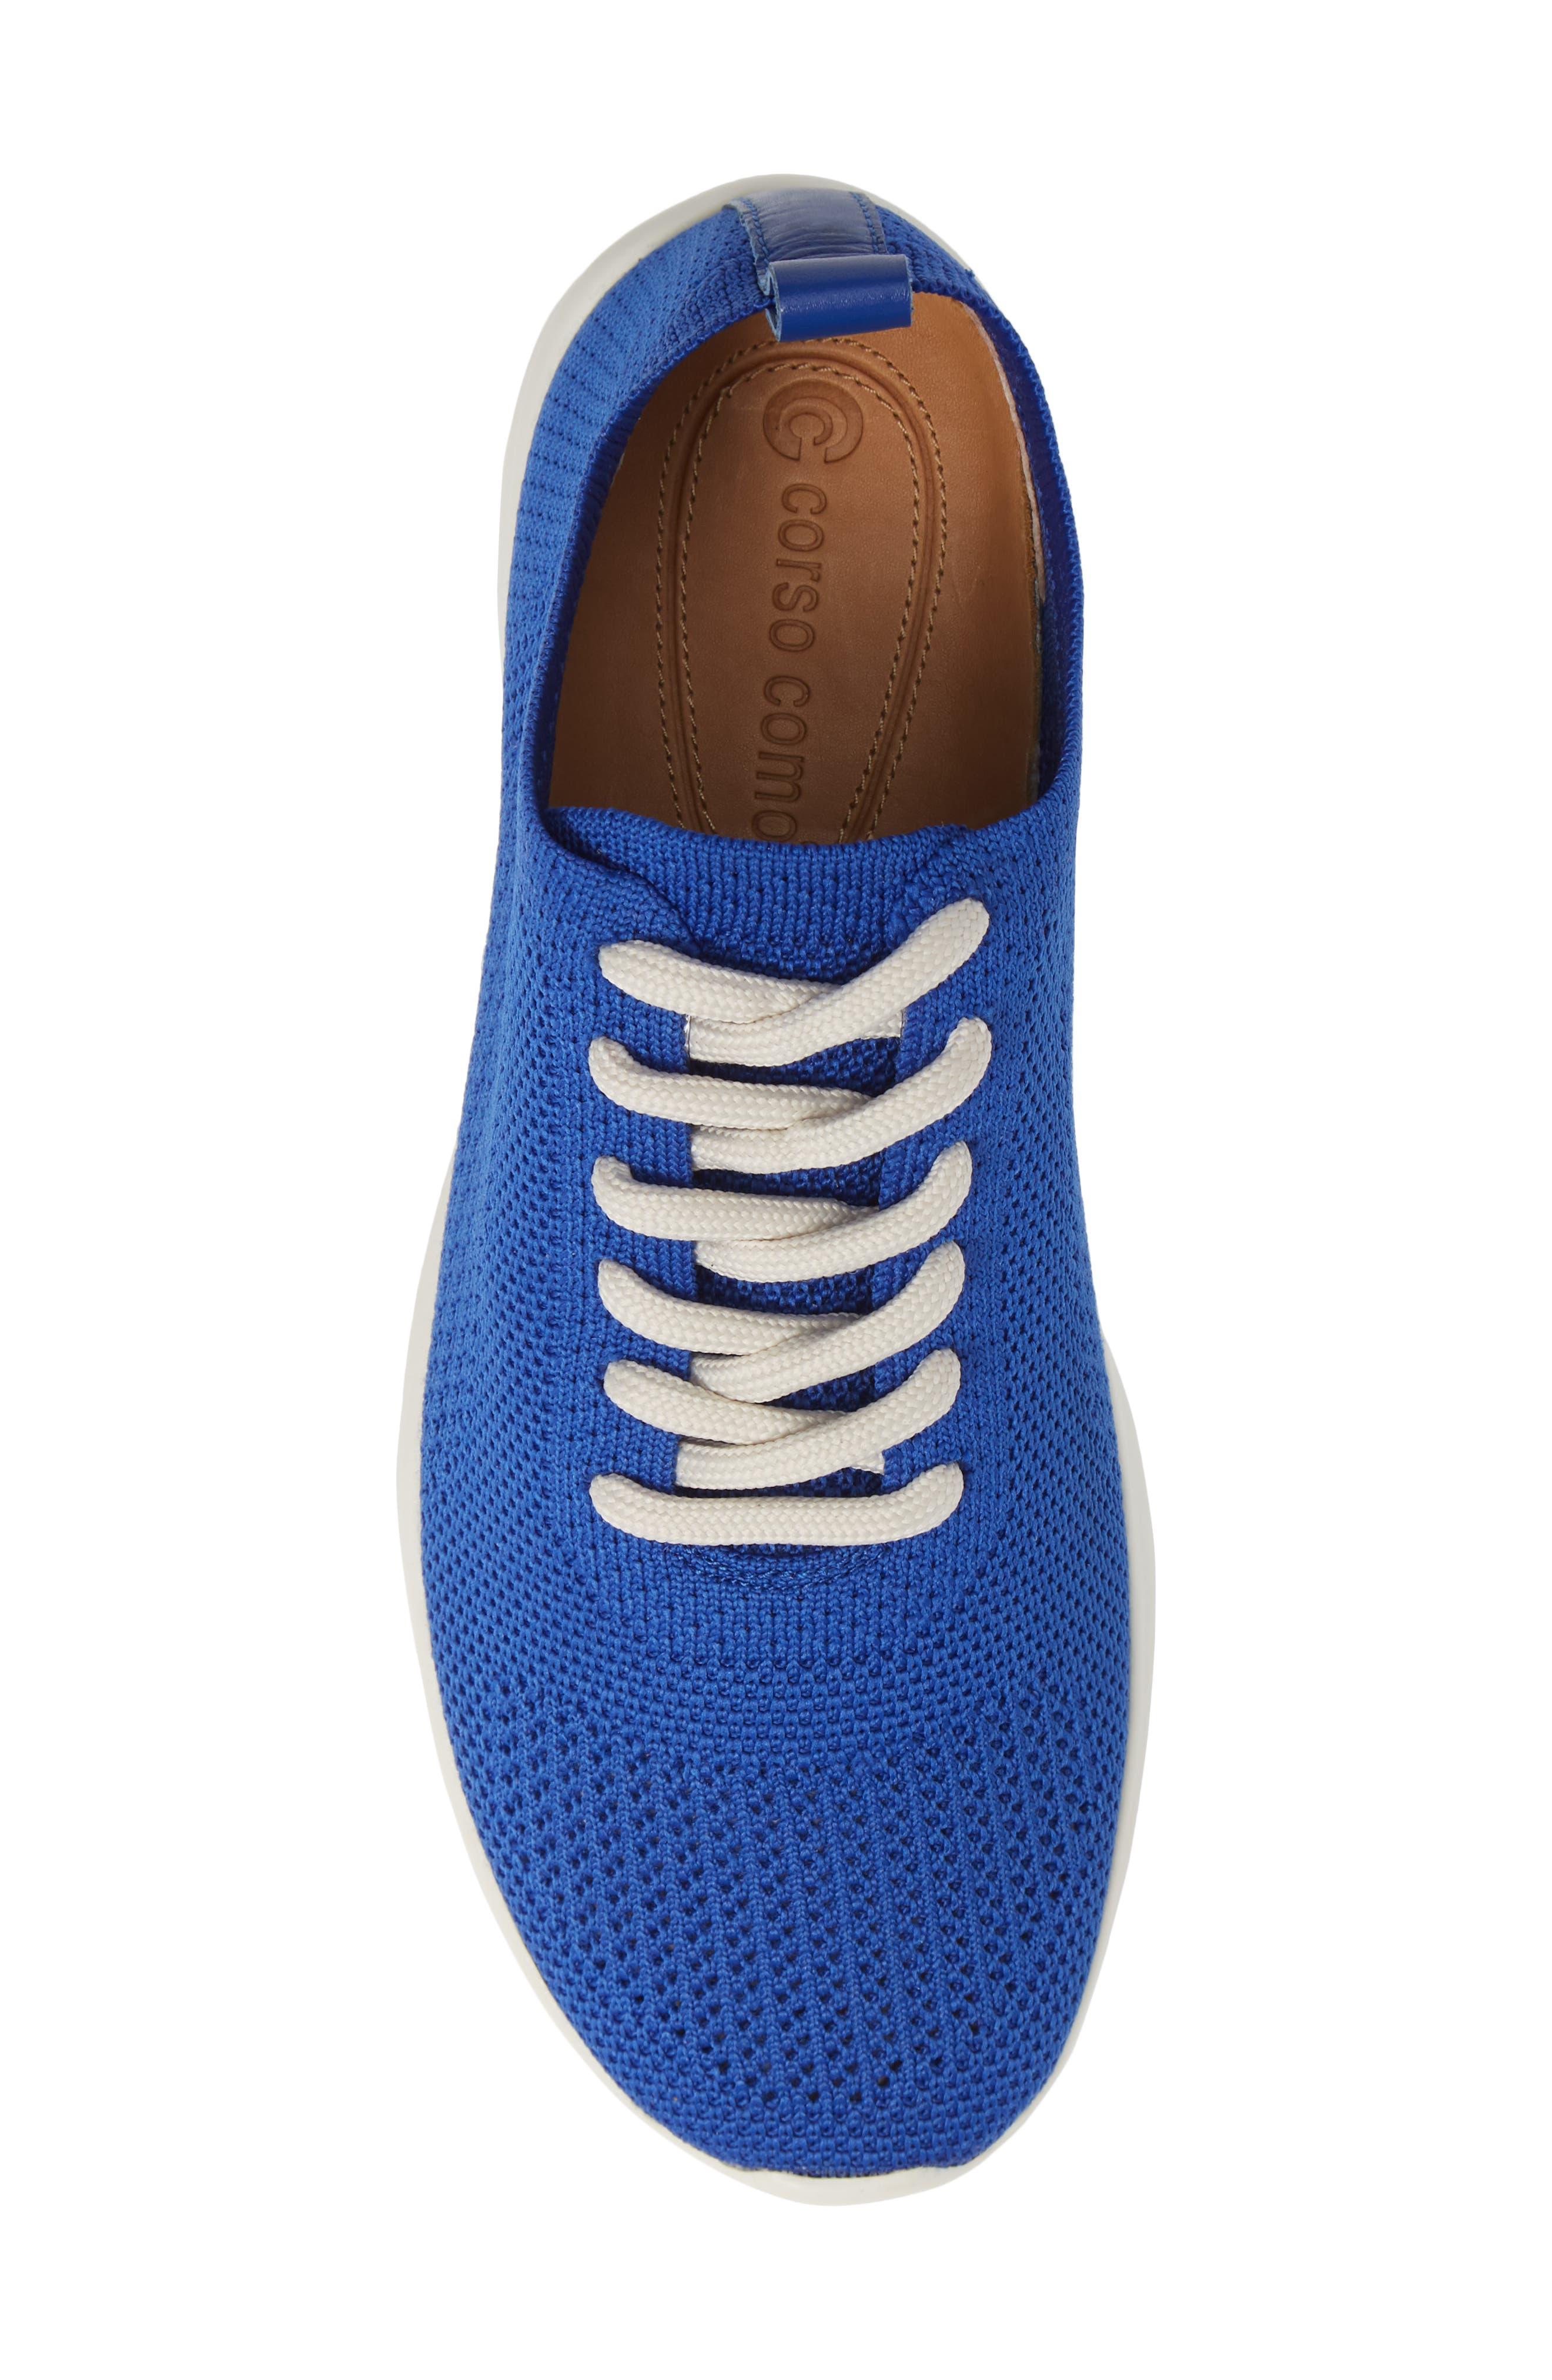 Randee Sneaker,                             Alternate thumbnail 3, color,                             Blue Fabric